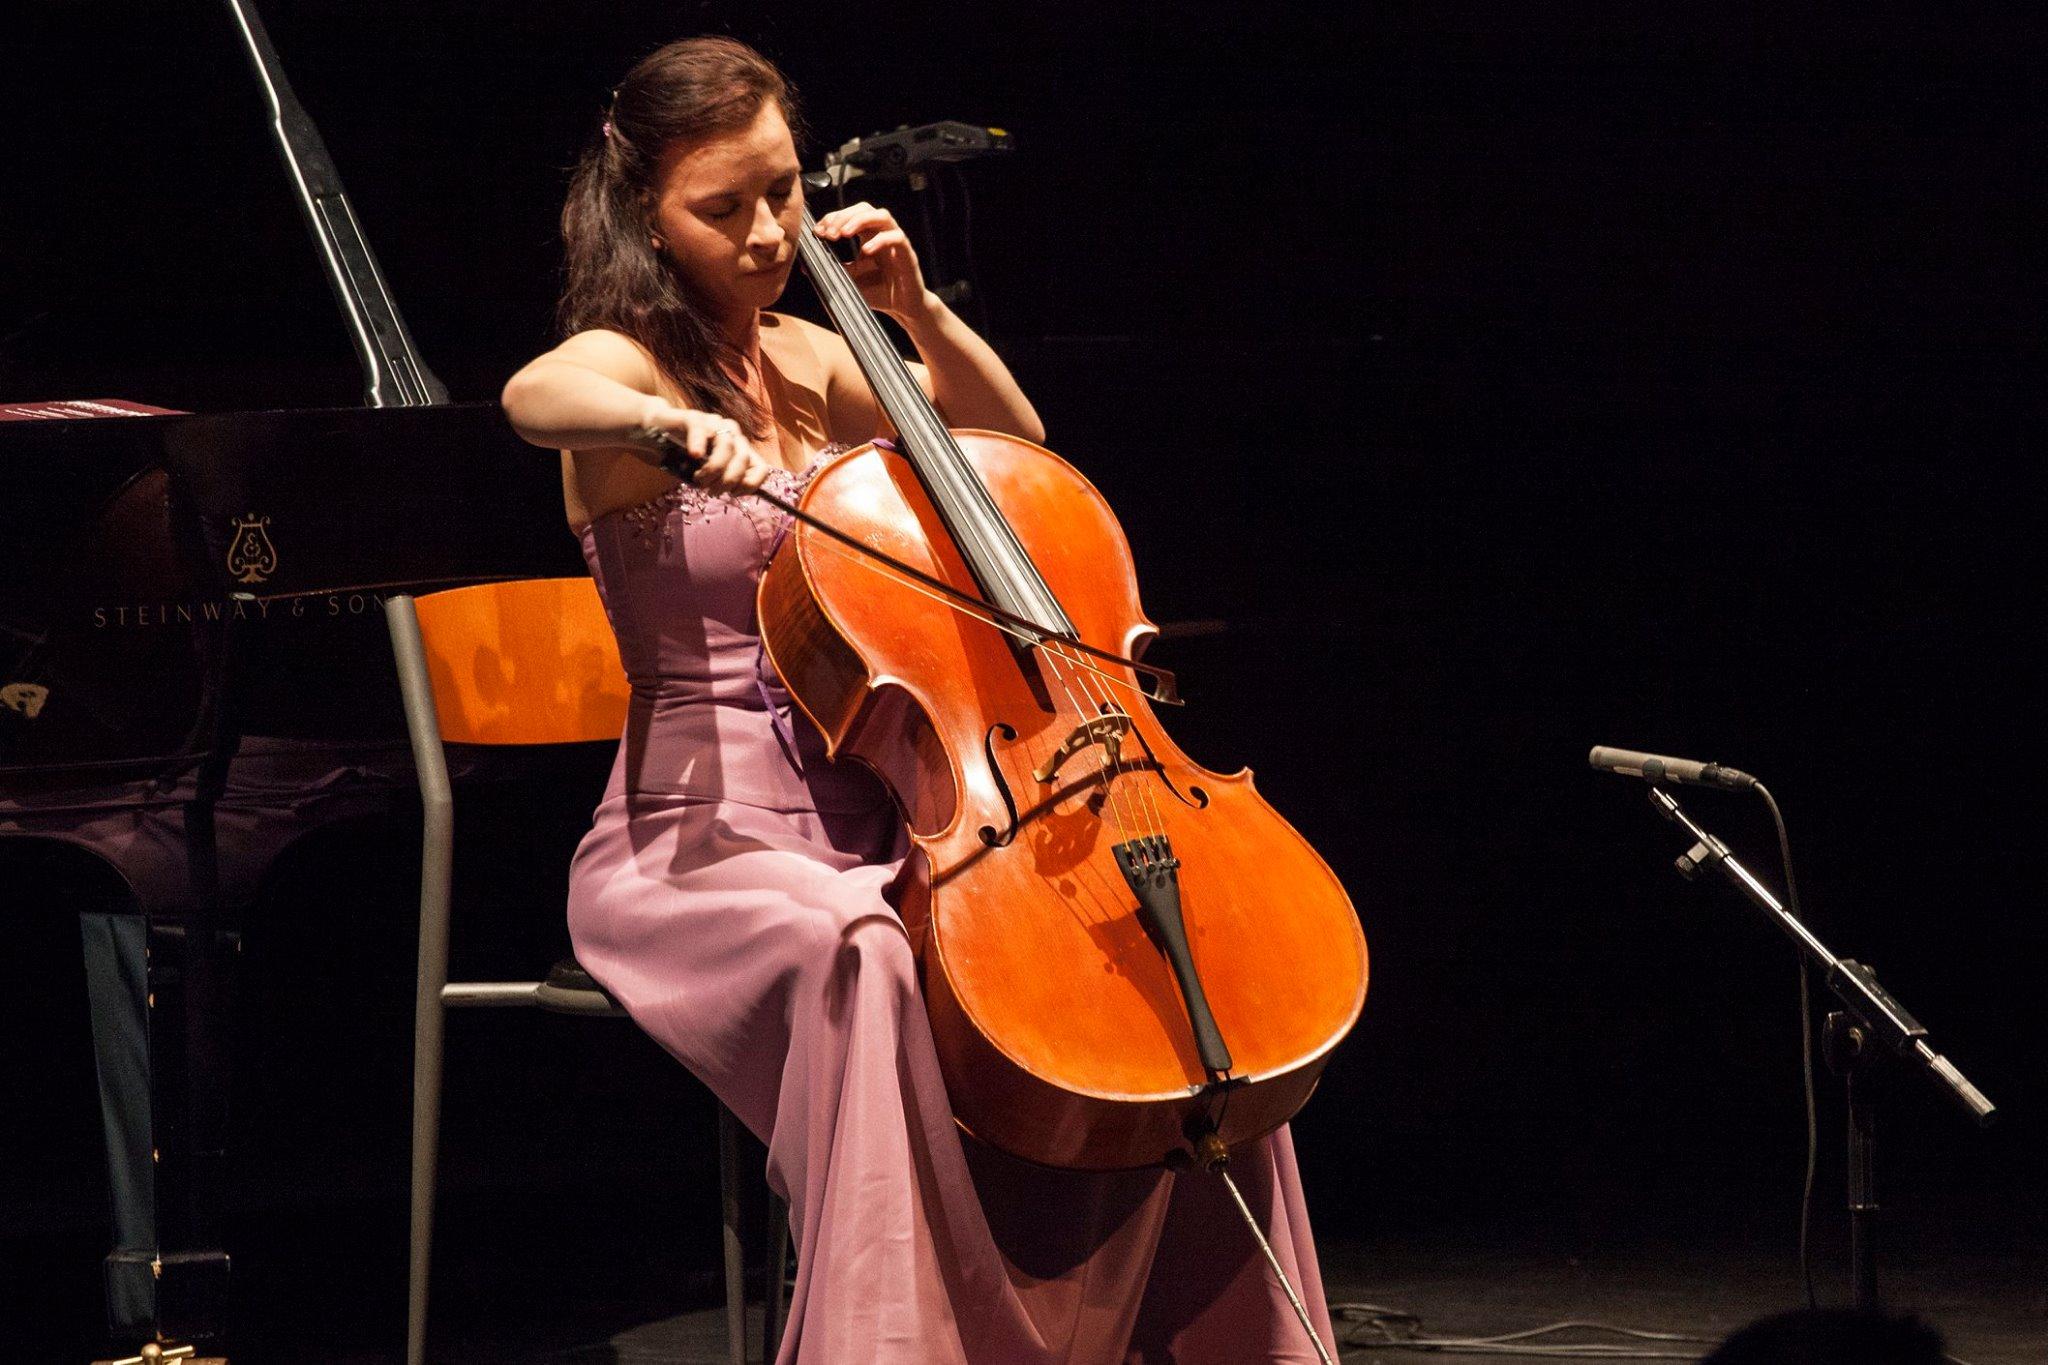 Valentina Crnjak - Croatian cellist based in Boston, MA. Teacher and international performer.